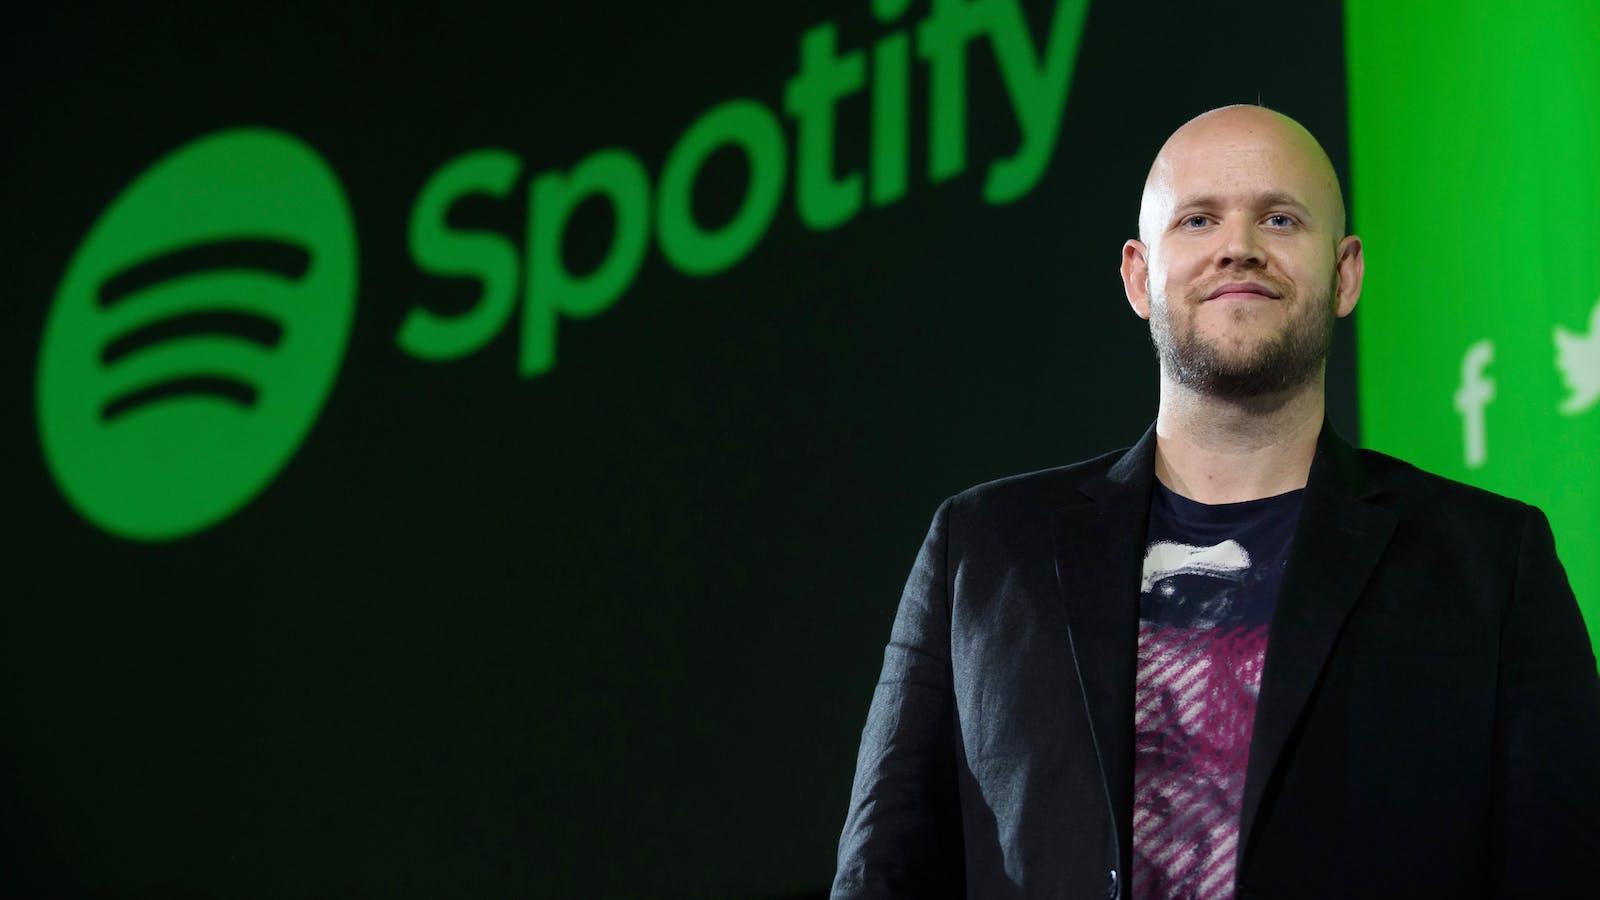 Spotify CEO Daniel Ek. Photo by Bloomberg.